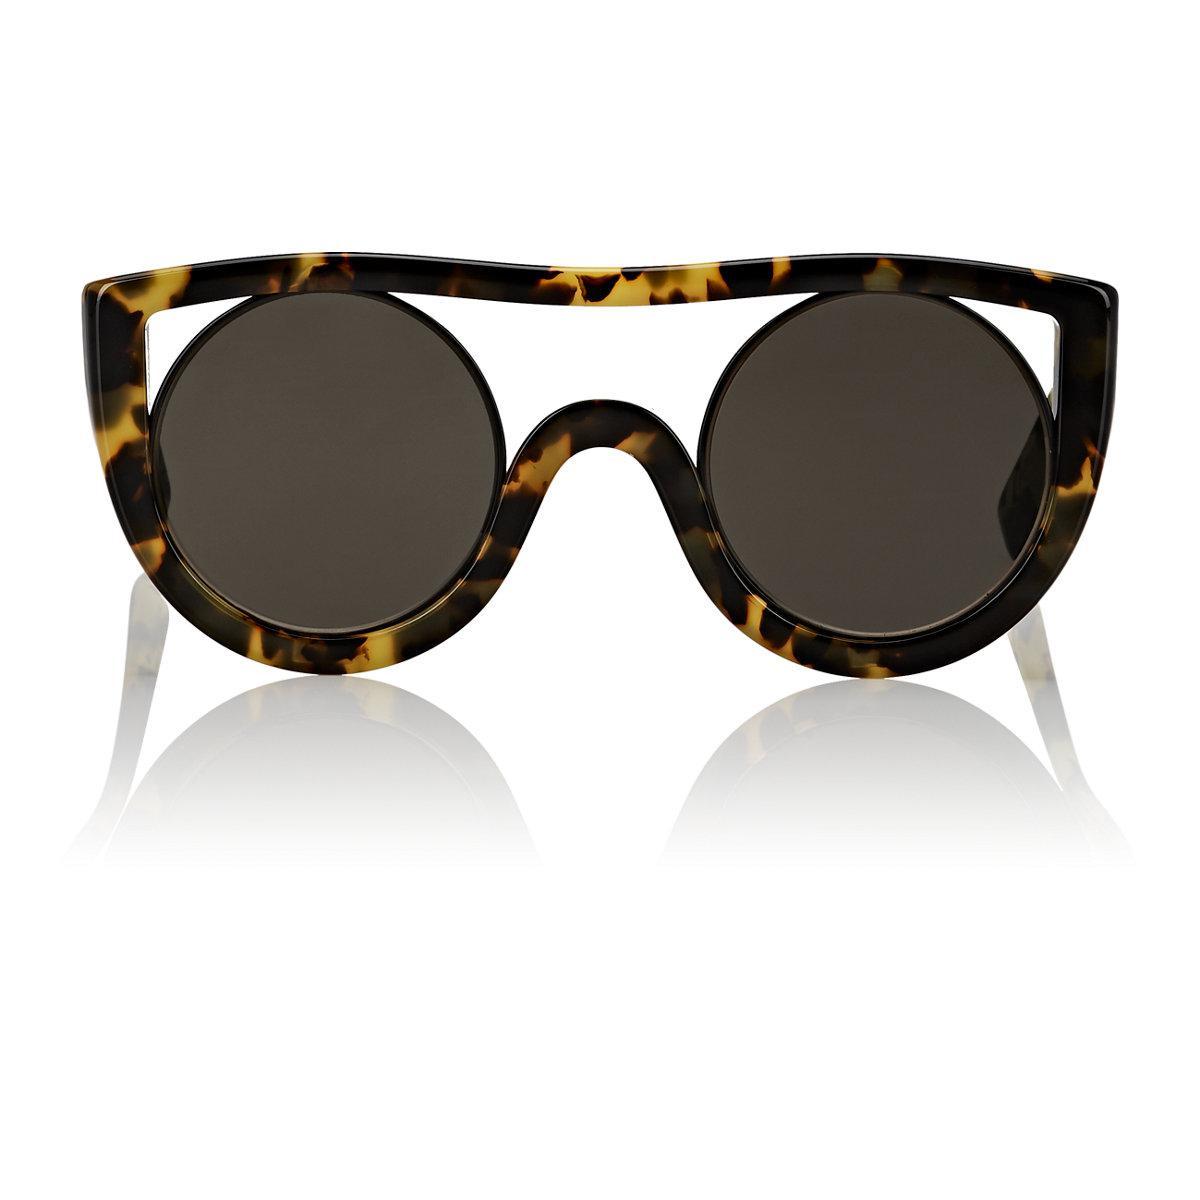 7401e7ac7d Lyst - Alain Mikli Ayer Sunglasses in Brown